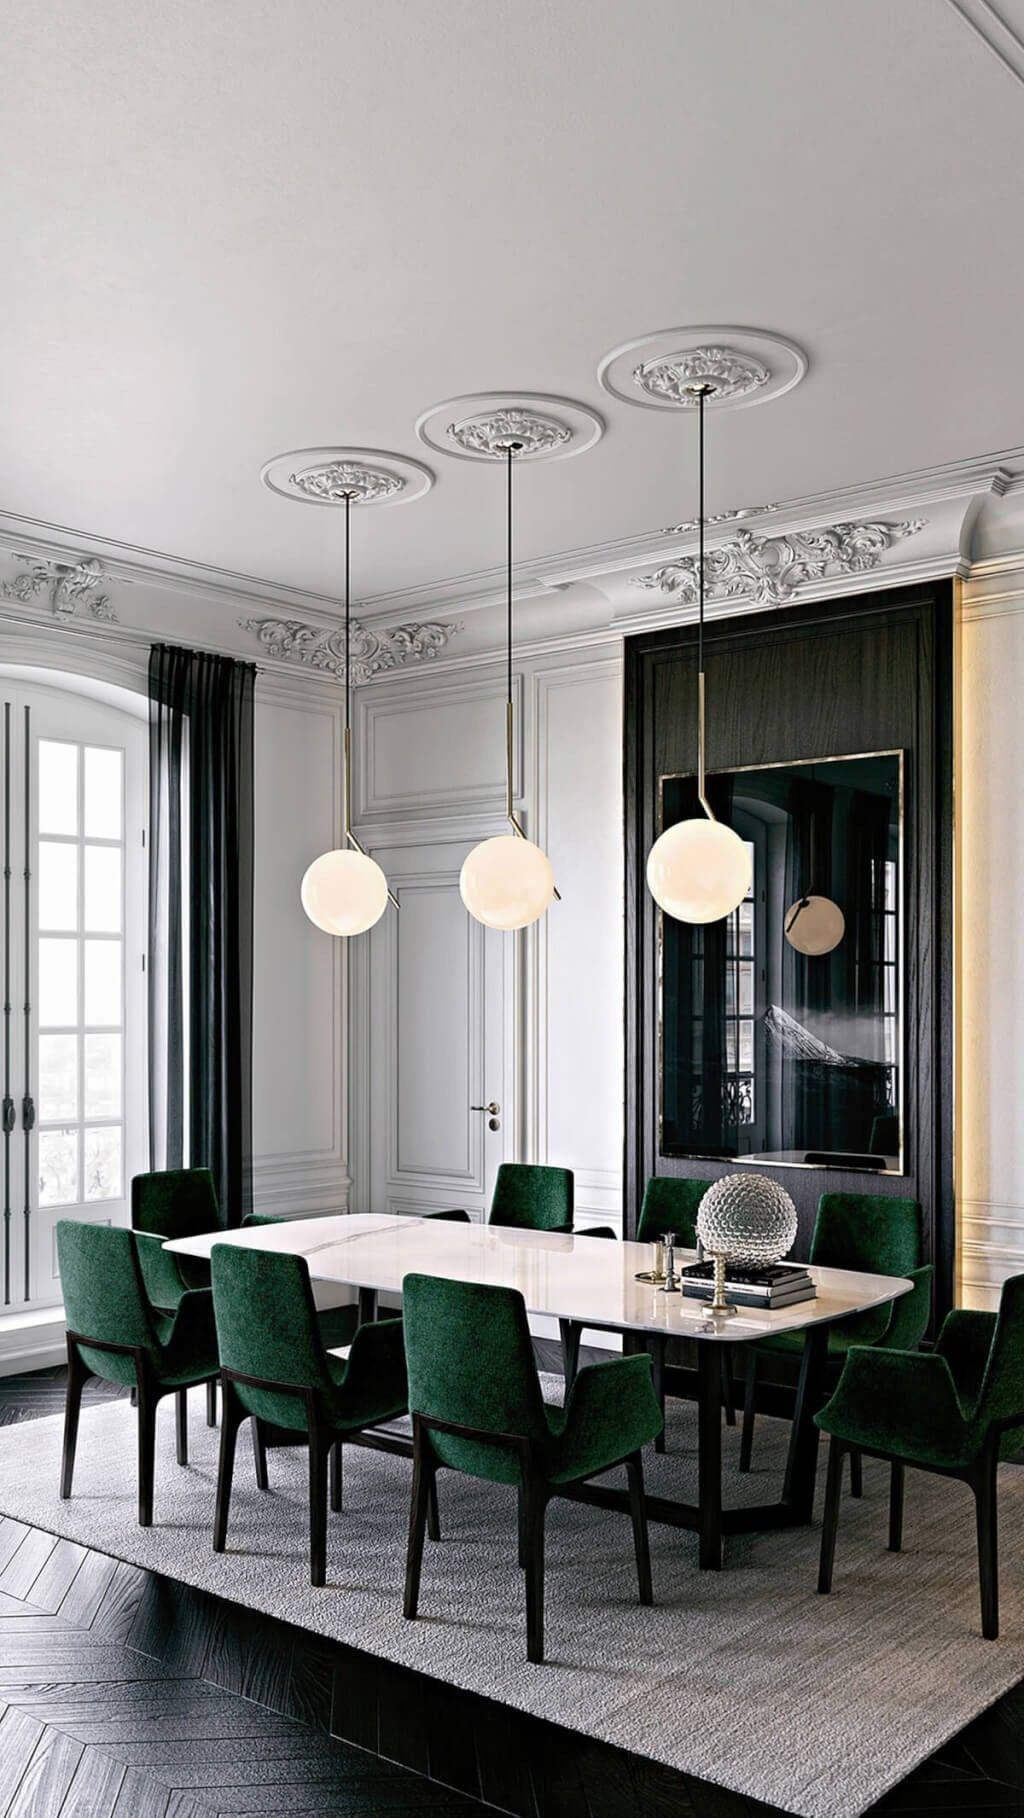 Pin By Paul Winberg On Global Design Elegant Dining Room Dining Room Design Luxury Dining Room